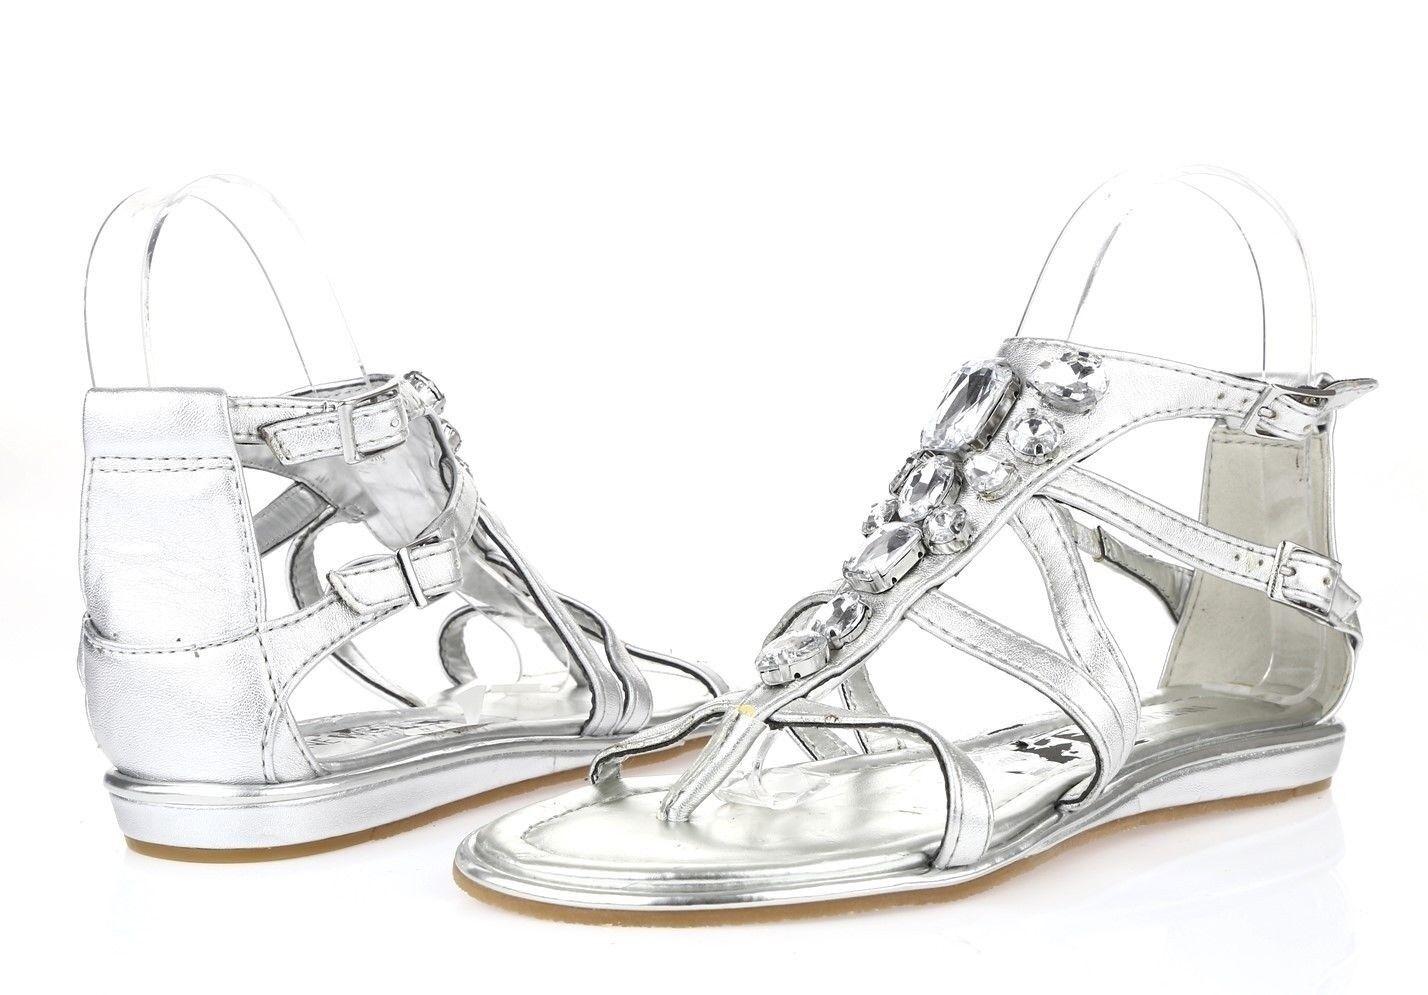 Women's NINE WEST 227550 silver jeweled ankle strap sandals sz. 9 M